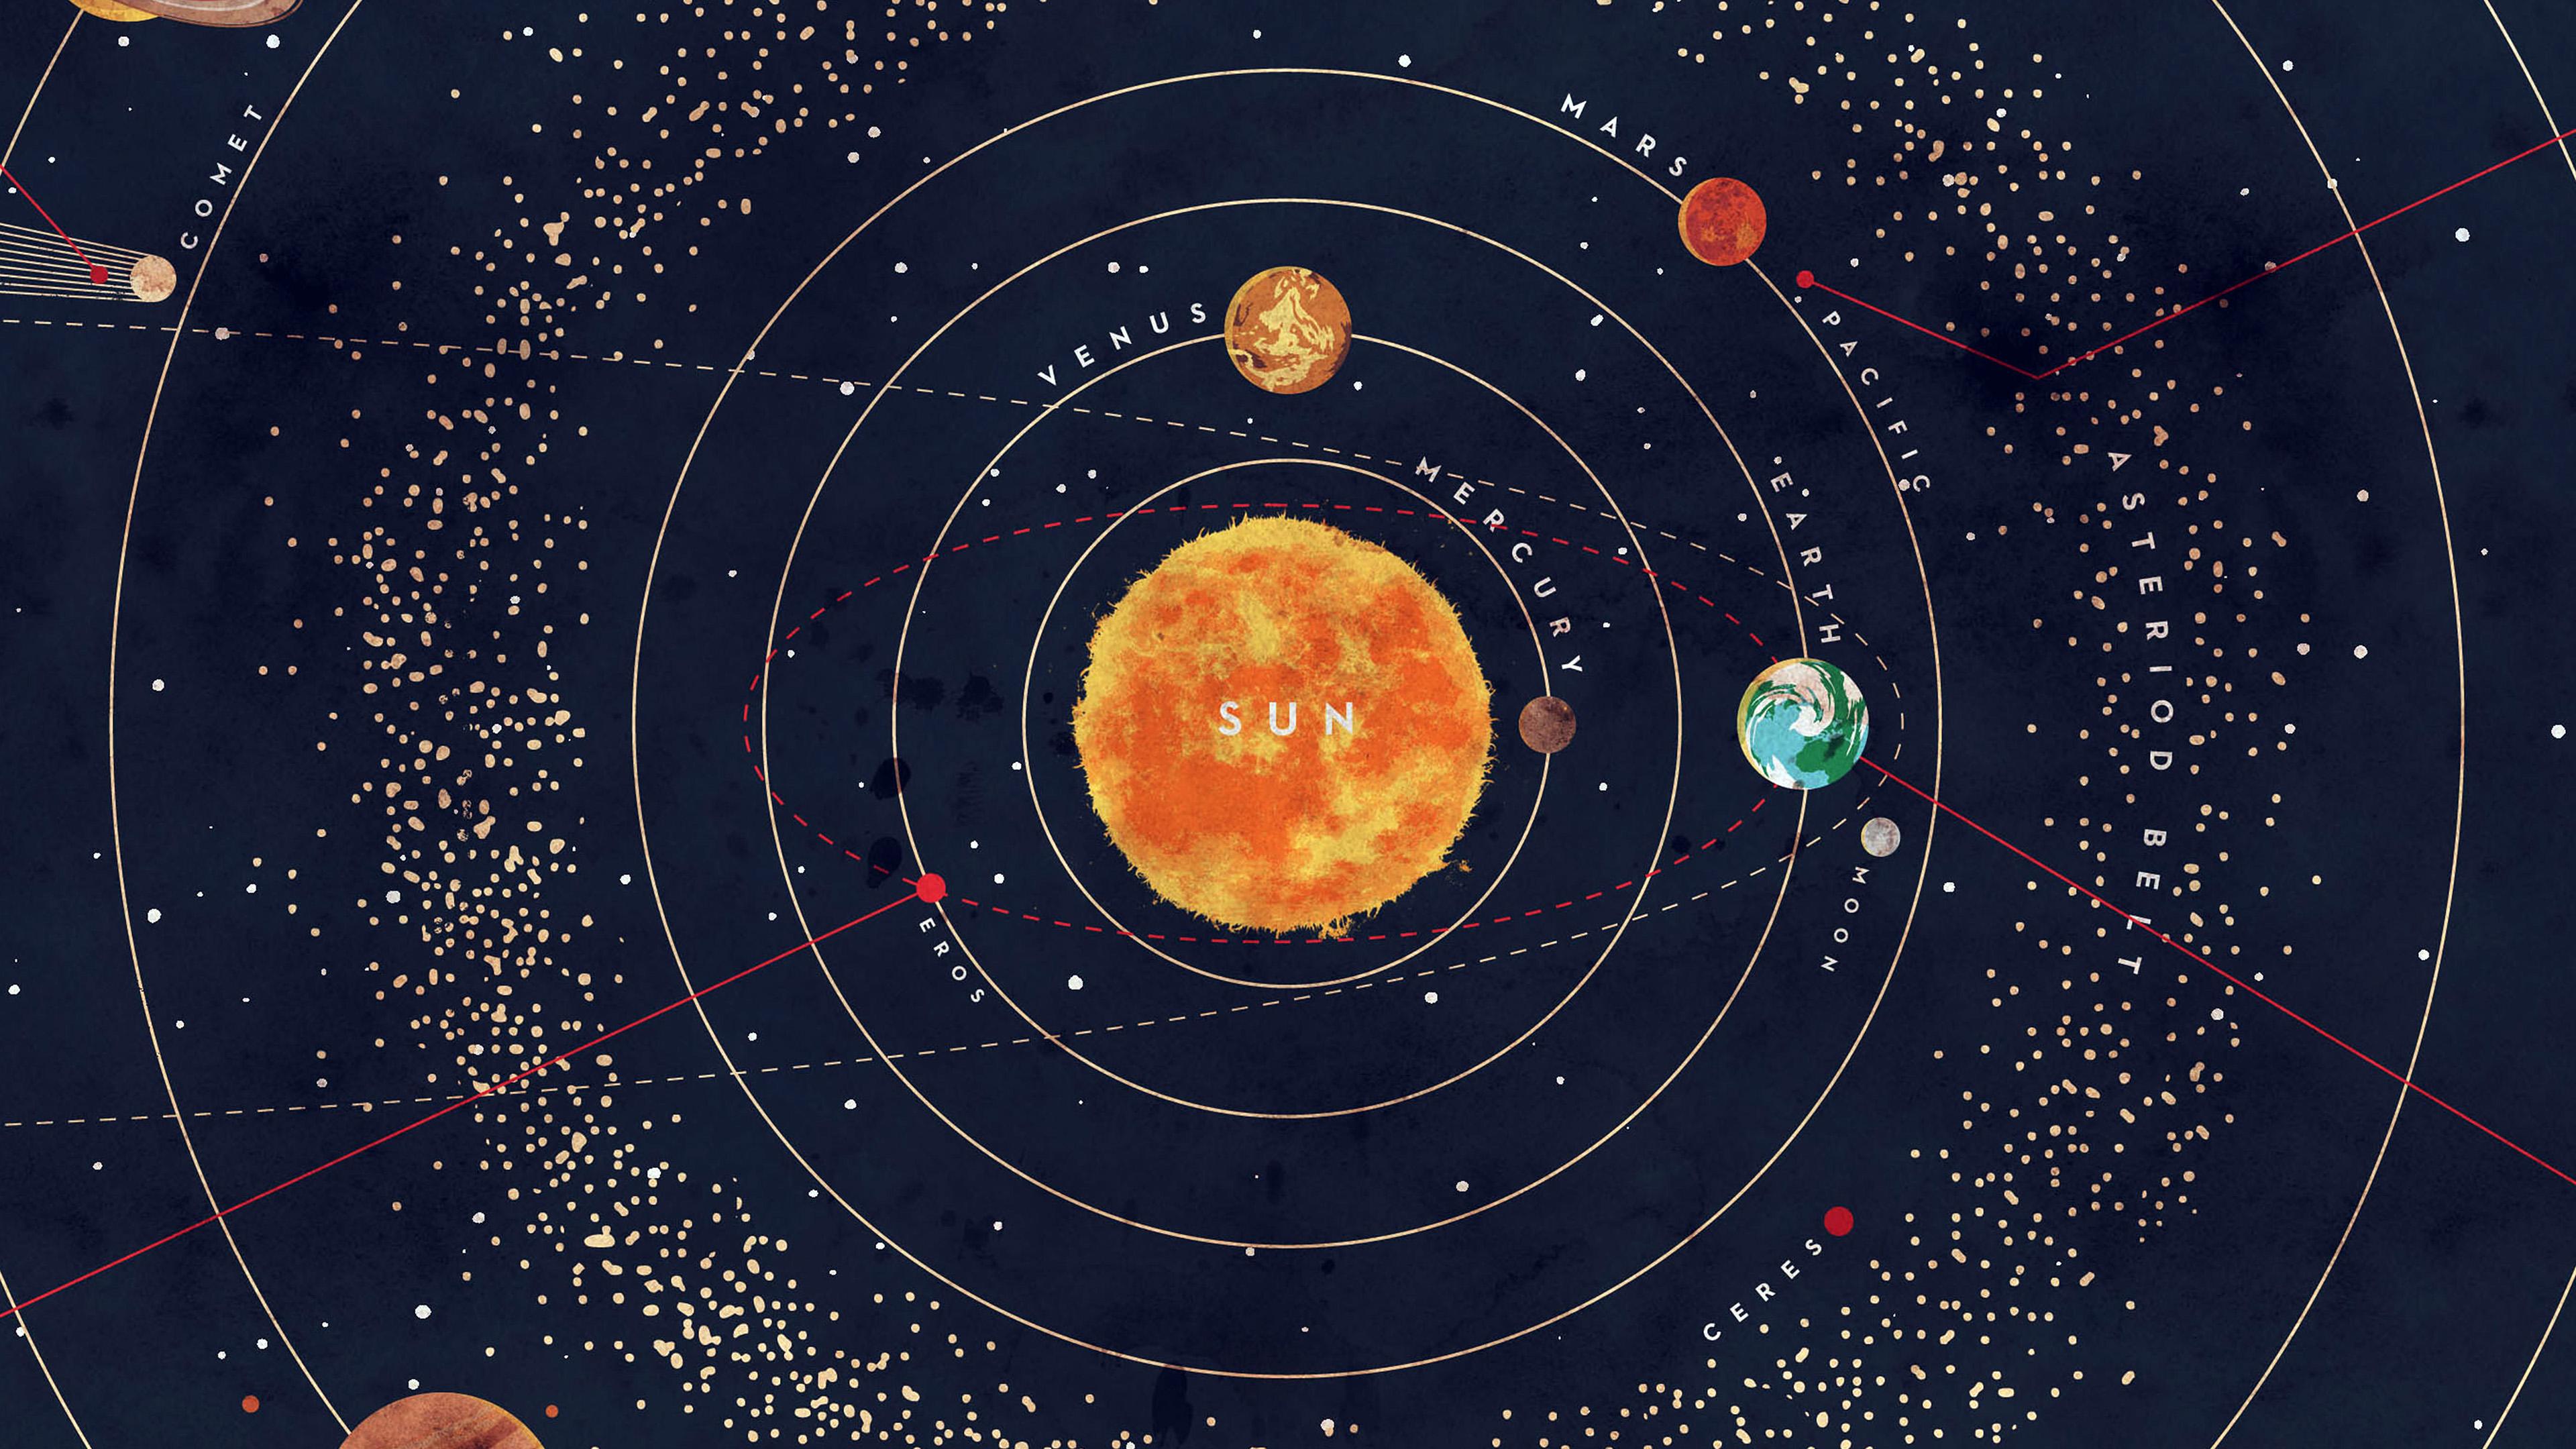 wallpaper for desktop, laptop | ar63-solar-system-space ...